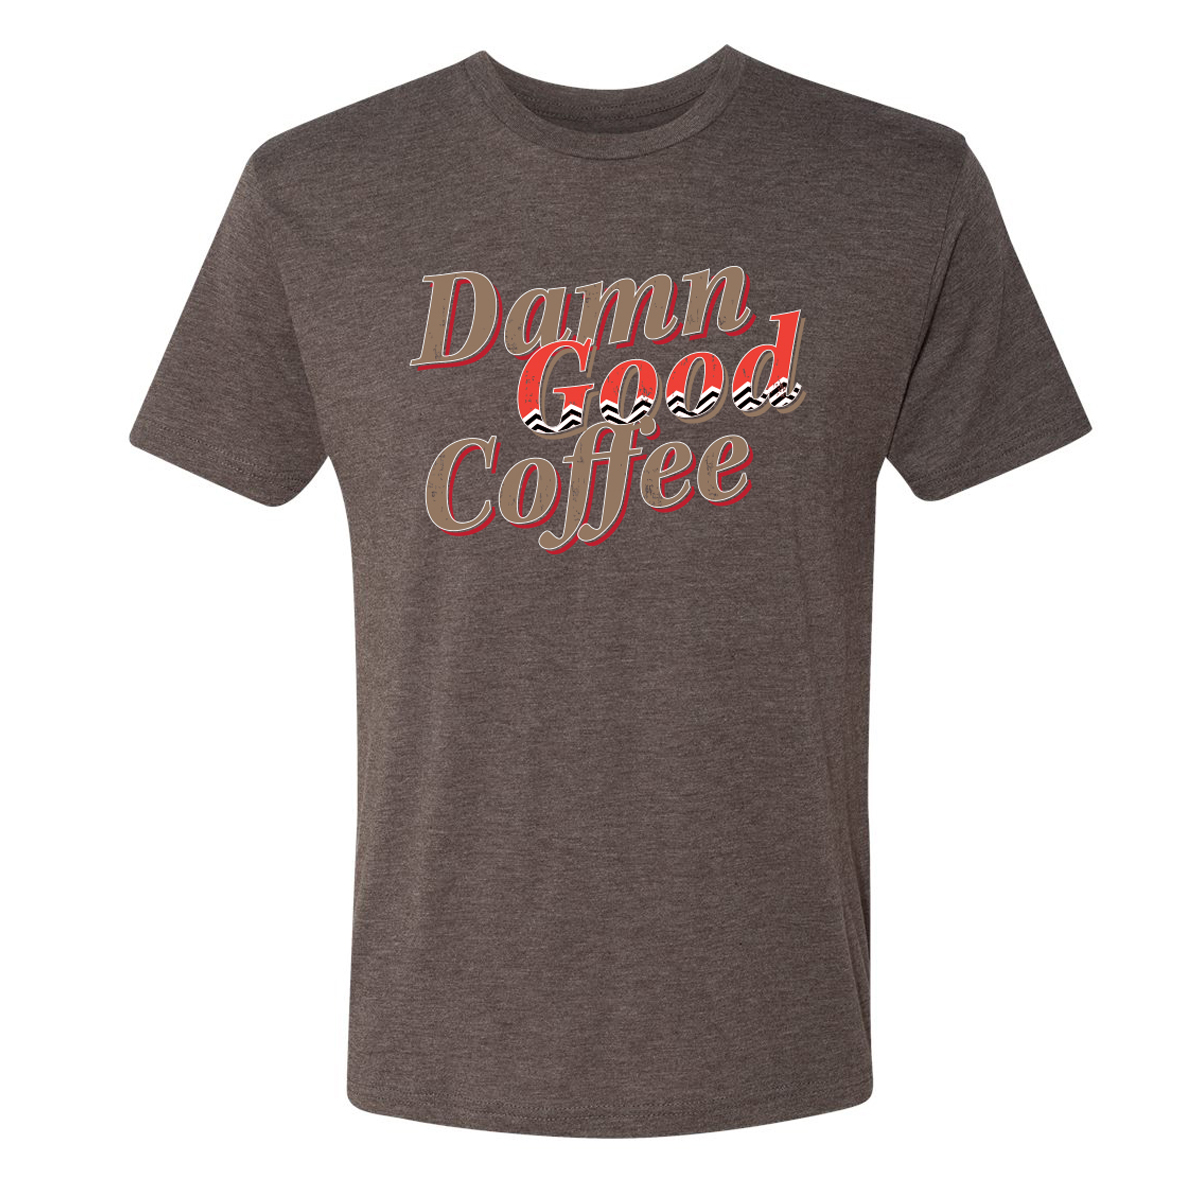 Twin Peaks Damn Good Coffee Chevron T-Shirt